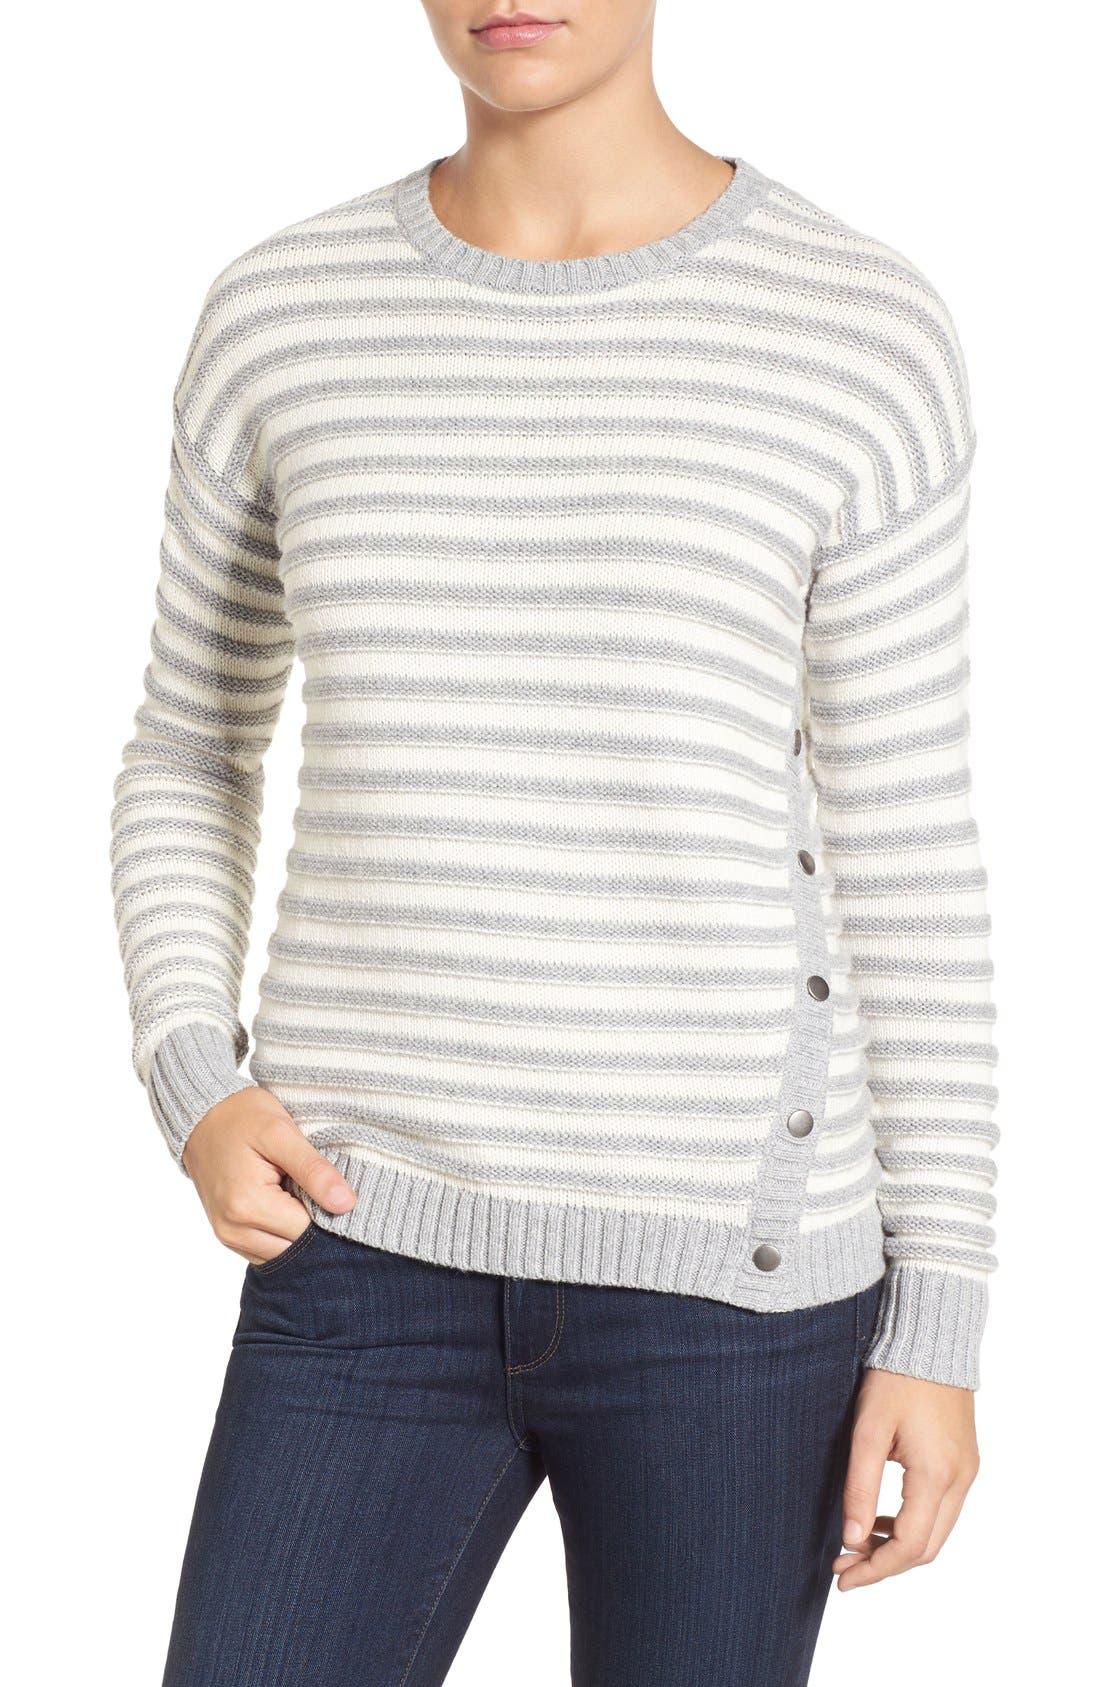 Alternate Image 1 Selected - Caslon® Side Snap Sweater (Regular & Petite)